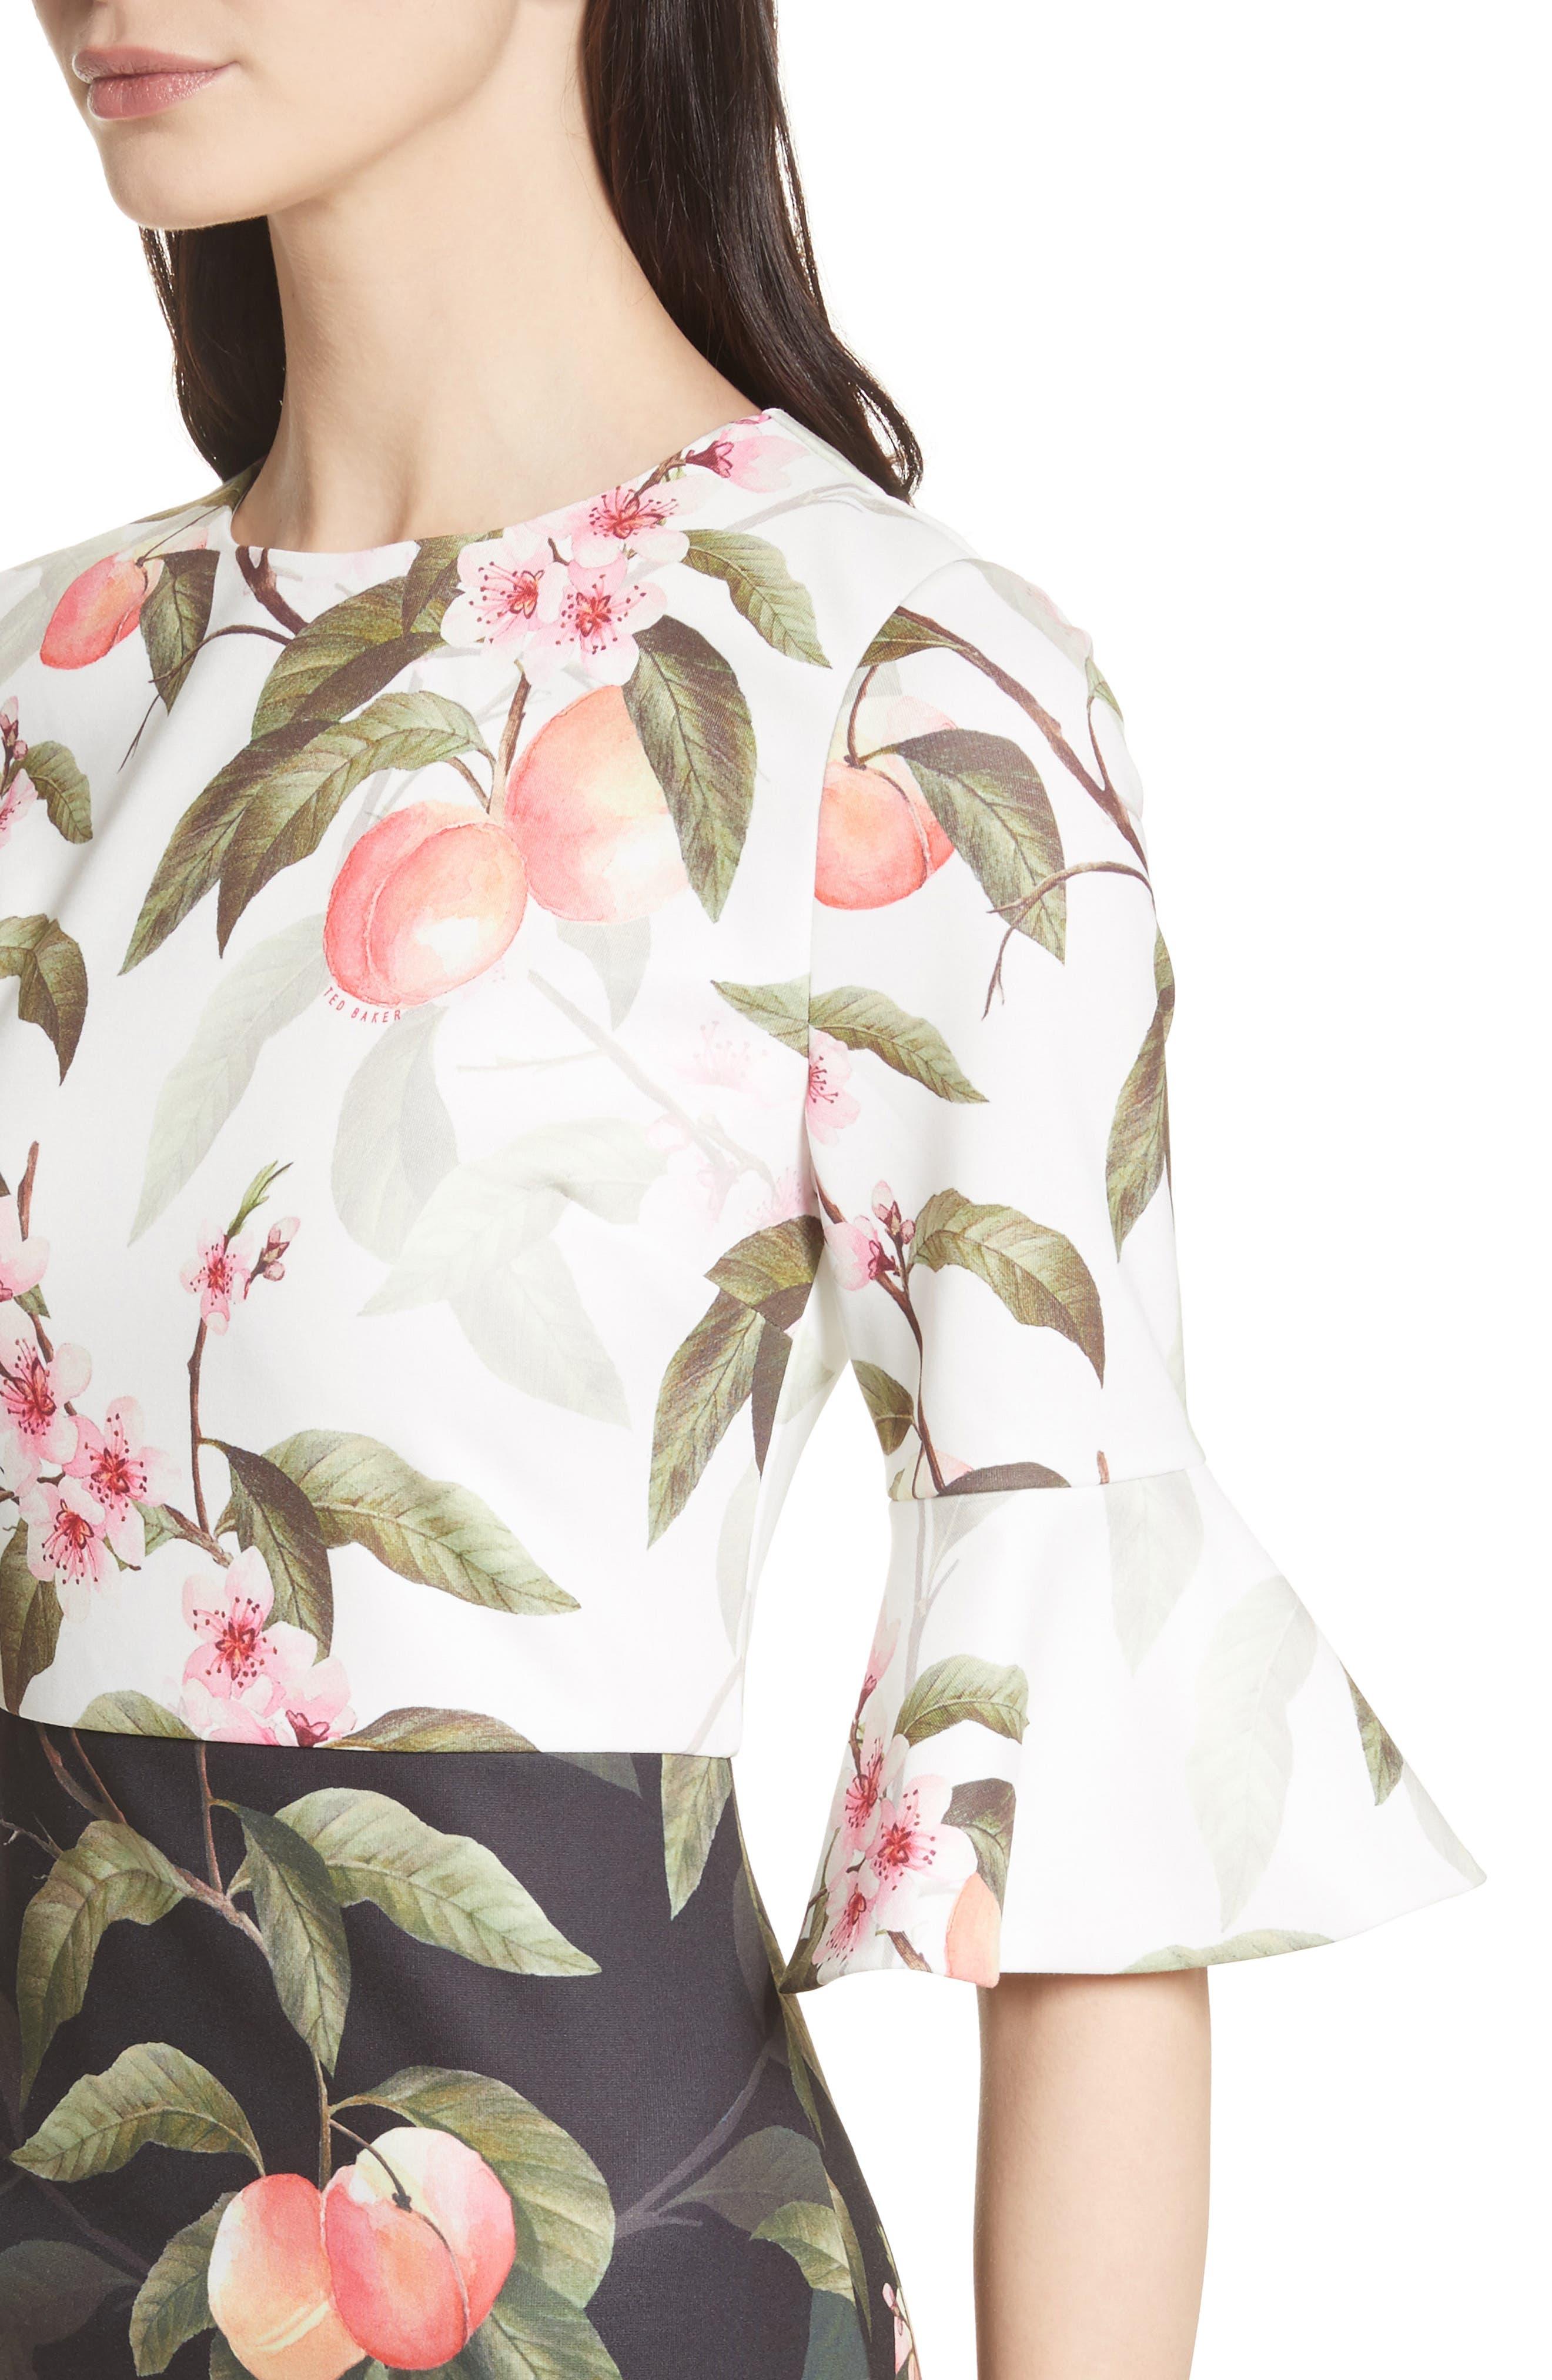 Peach Blossom Sheath Dress,                             Alternate thumbnail 4, color,                             Black